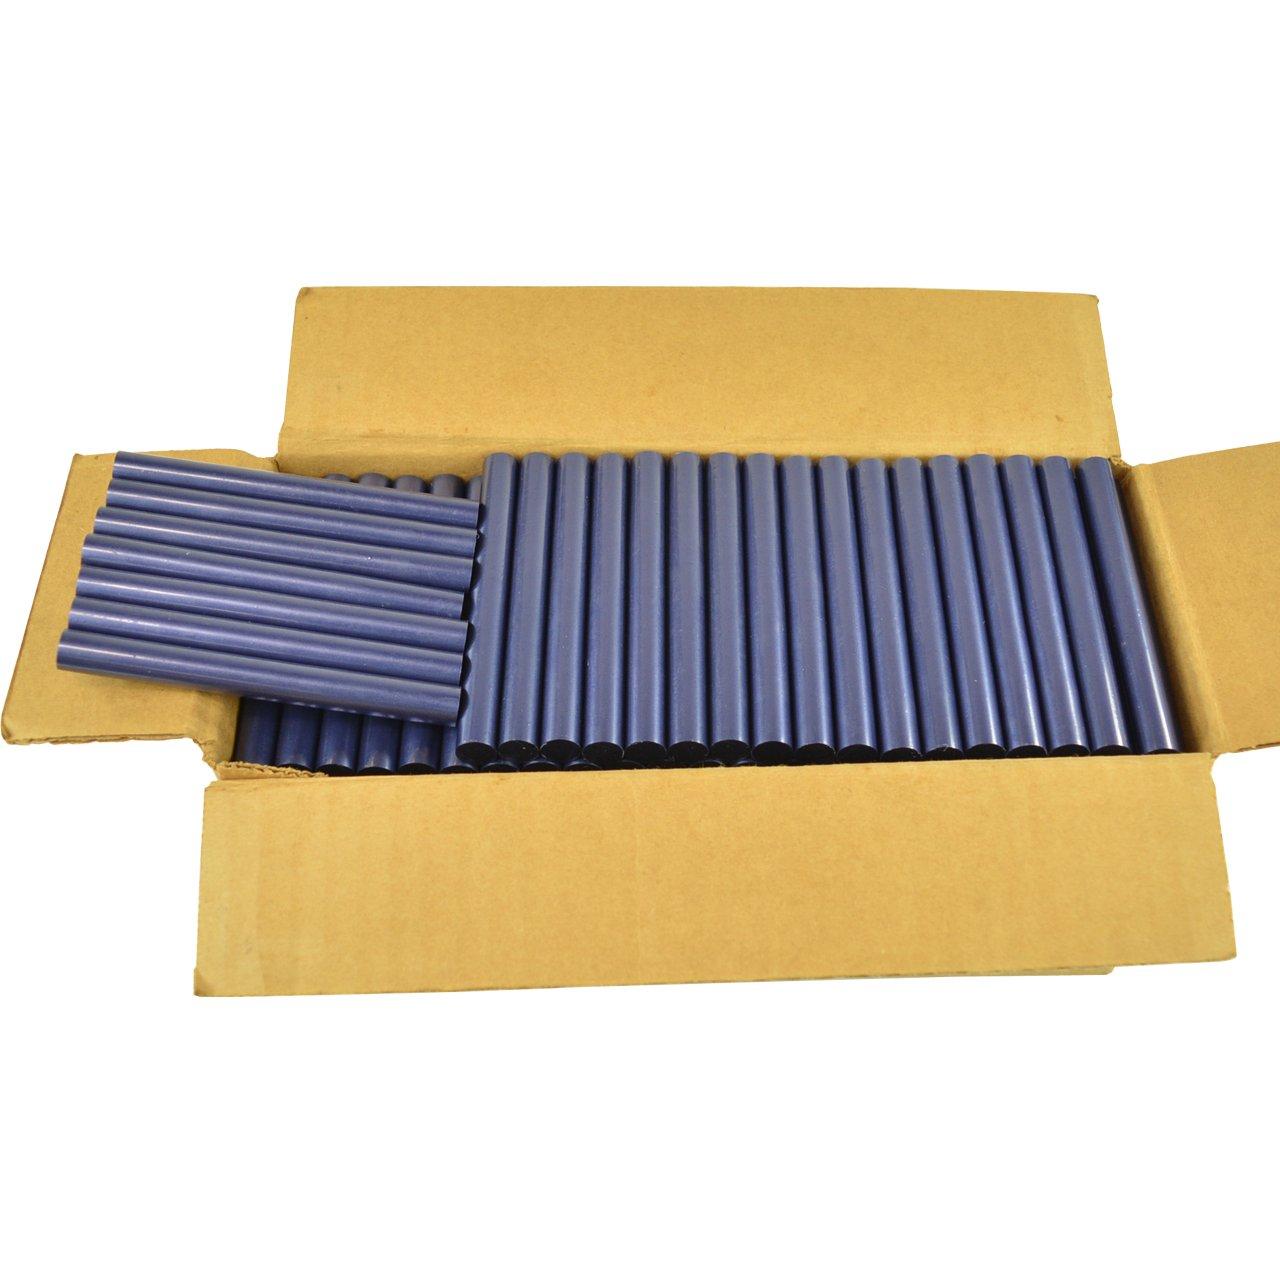 GlueSticksDirect Blue Colored Glue Sticks 7/16'' X 4'' 5 lbs